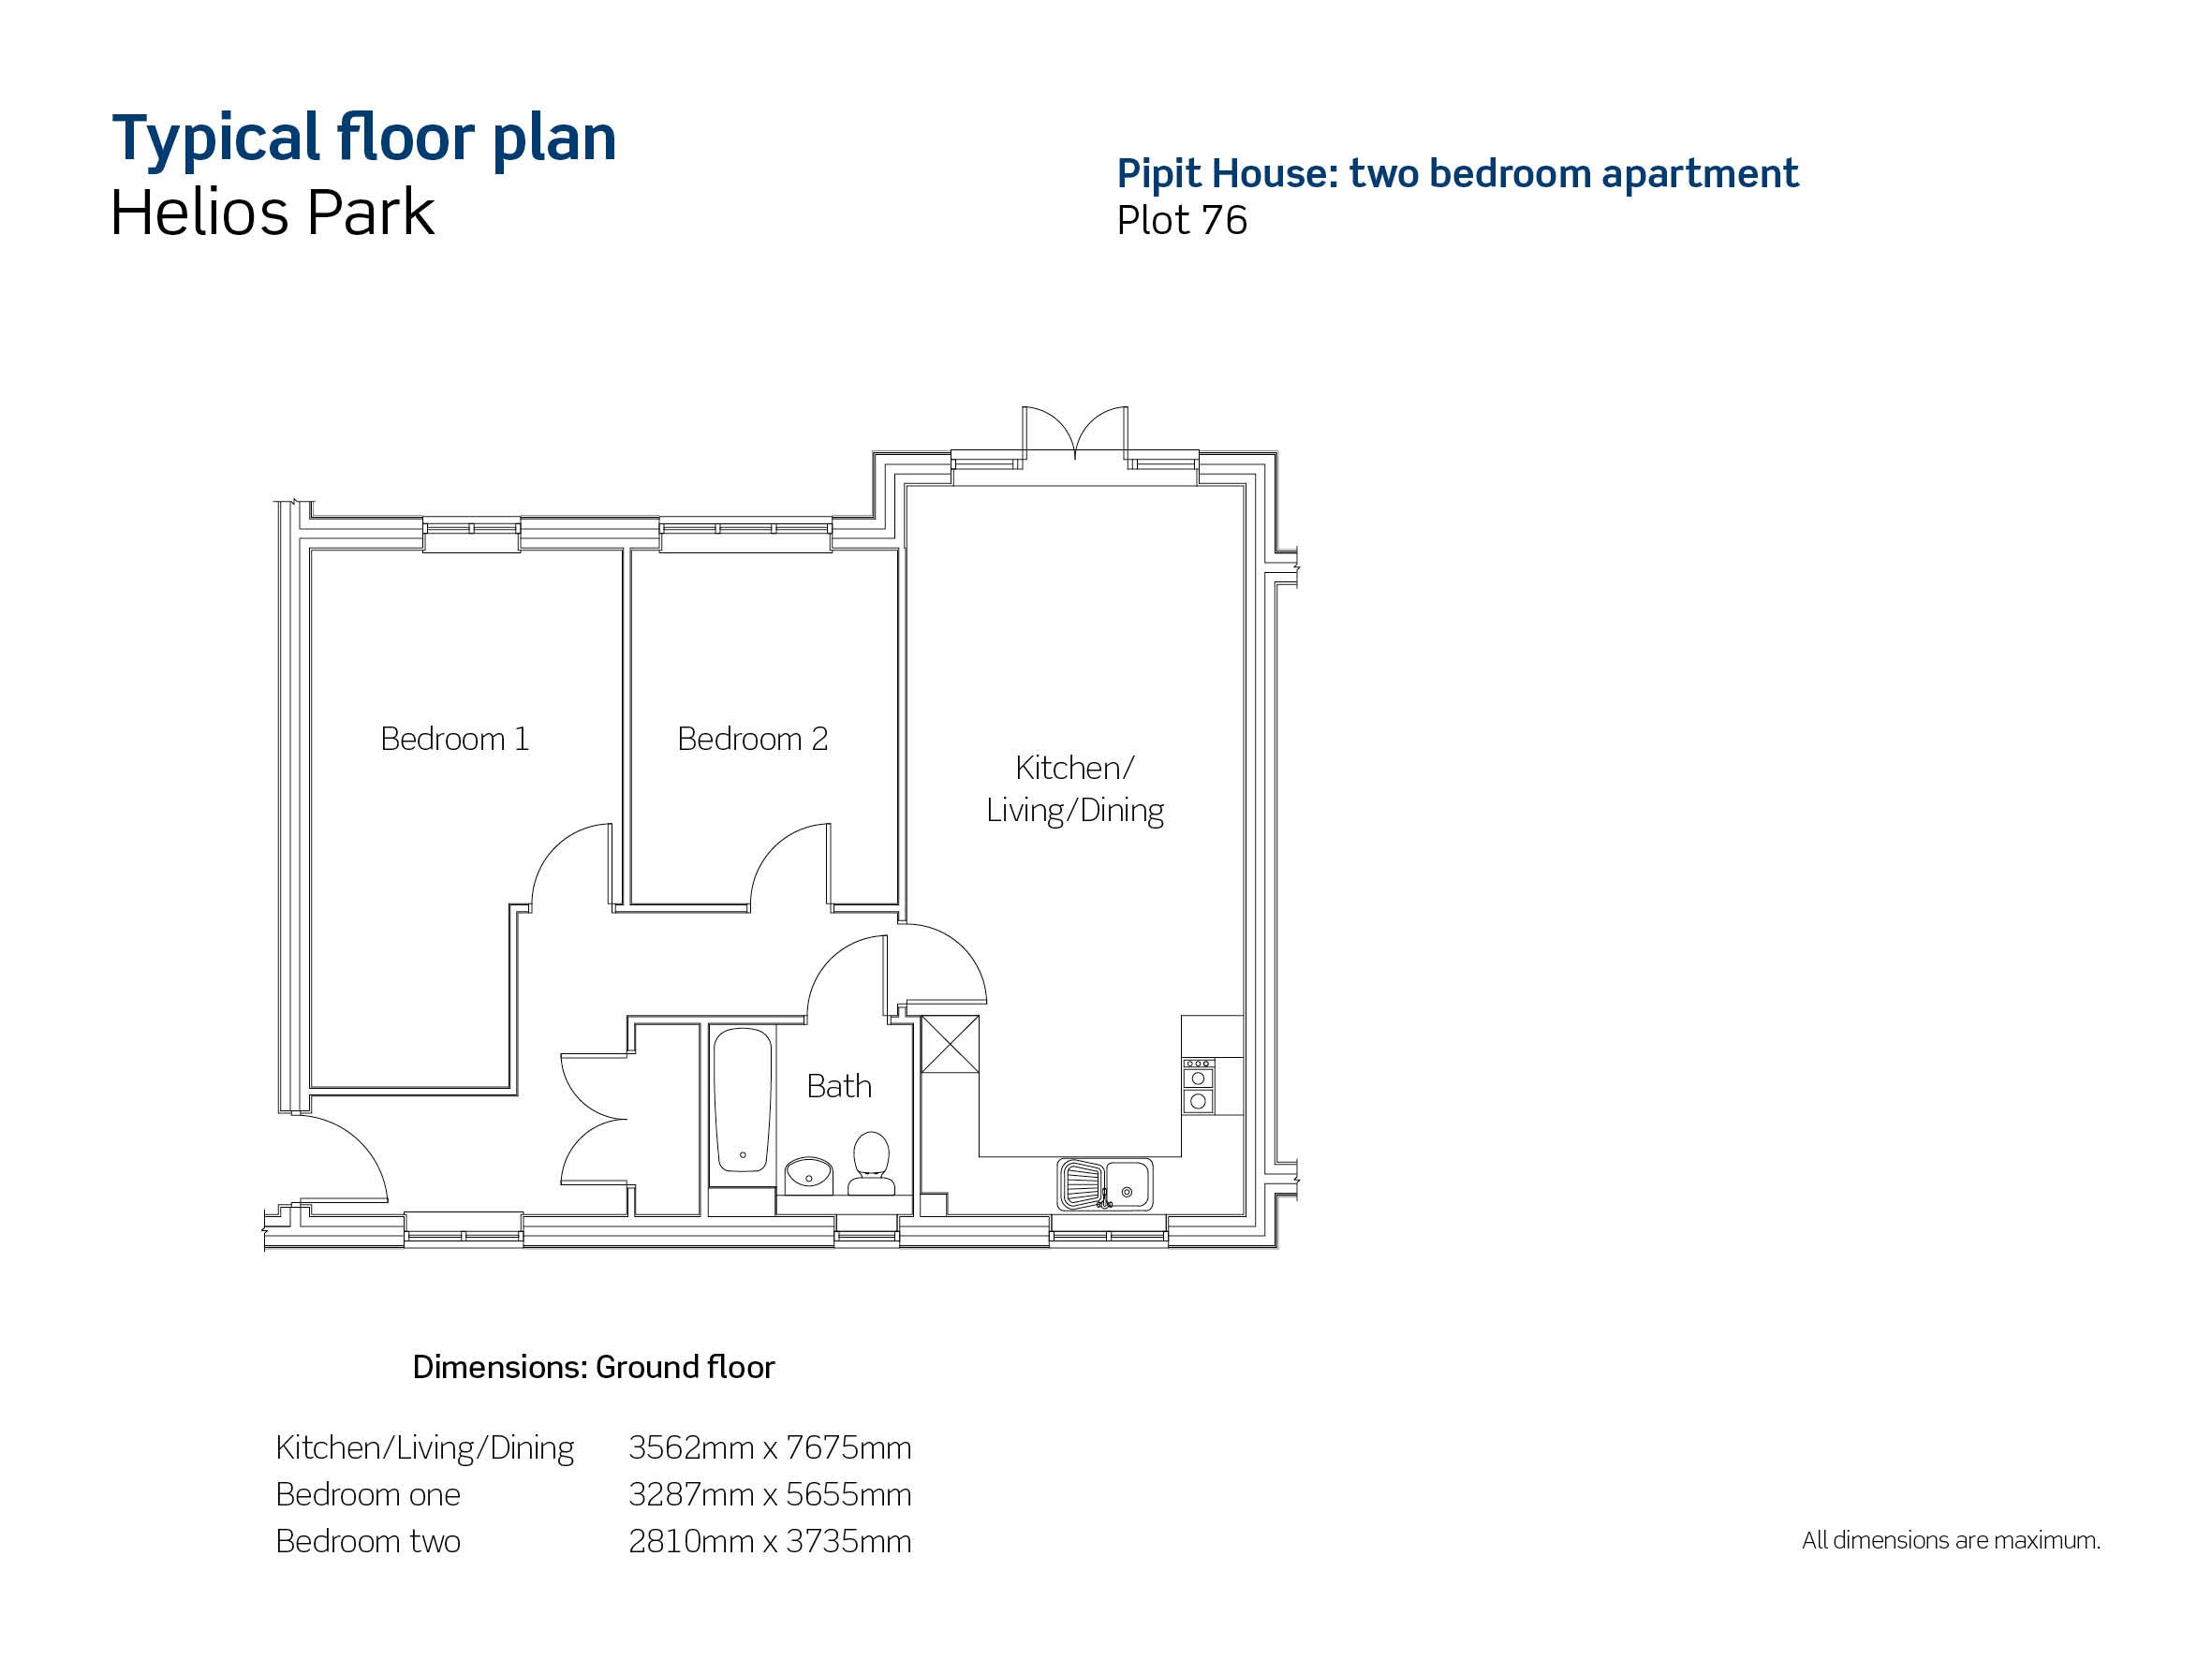 Helios Park plot 76 floor plan